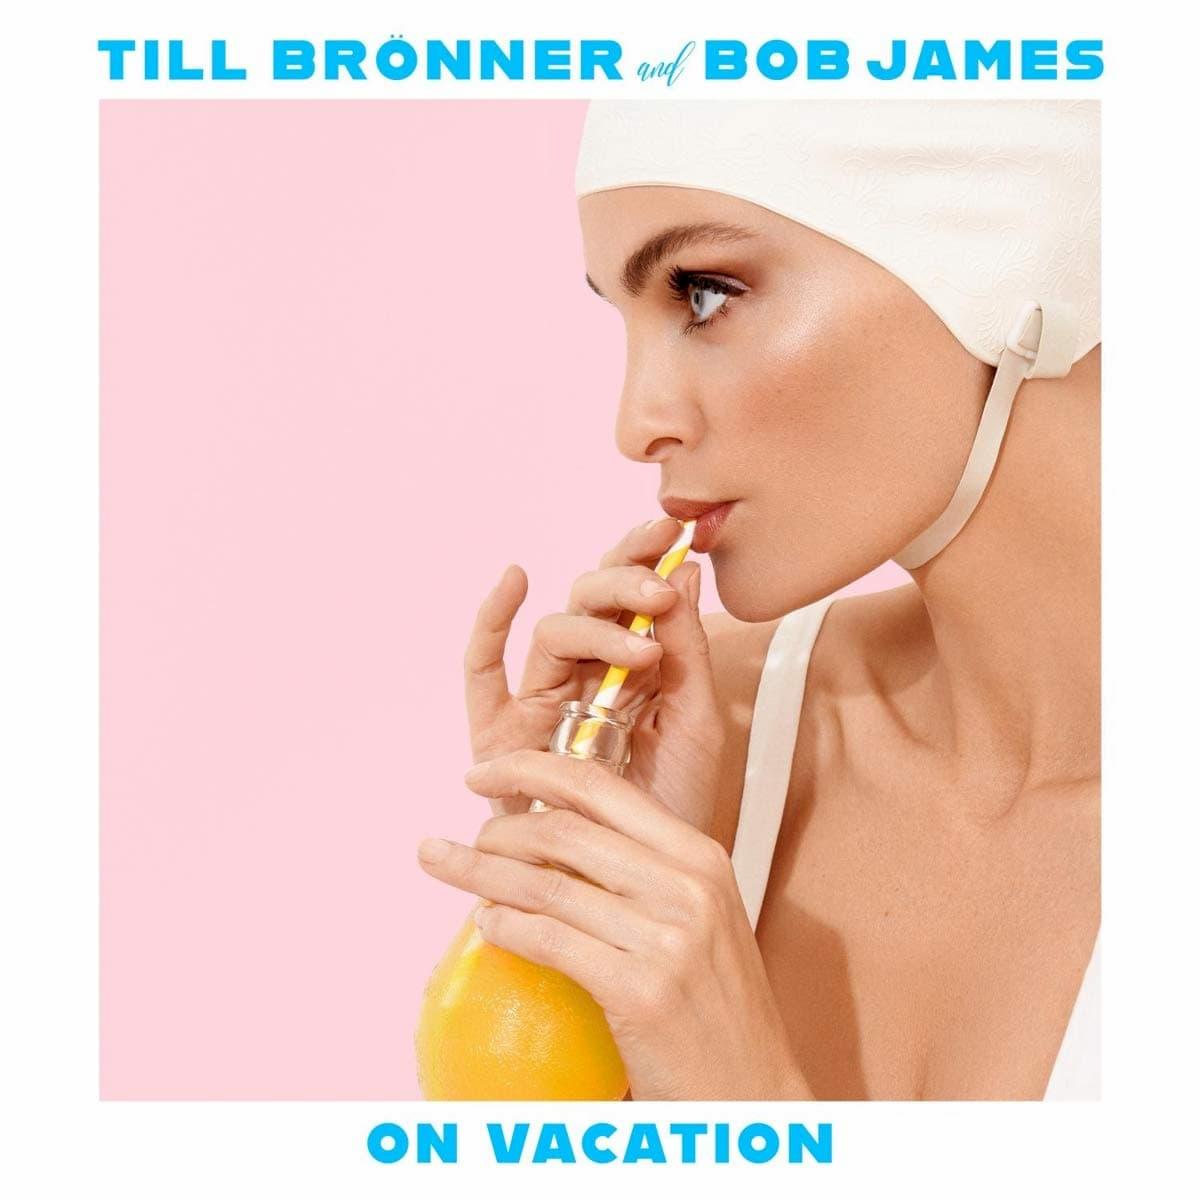 Neue Till Brönner CD mit Bob James On Vacation veröffentlicht